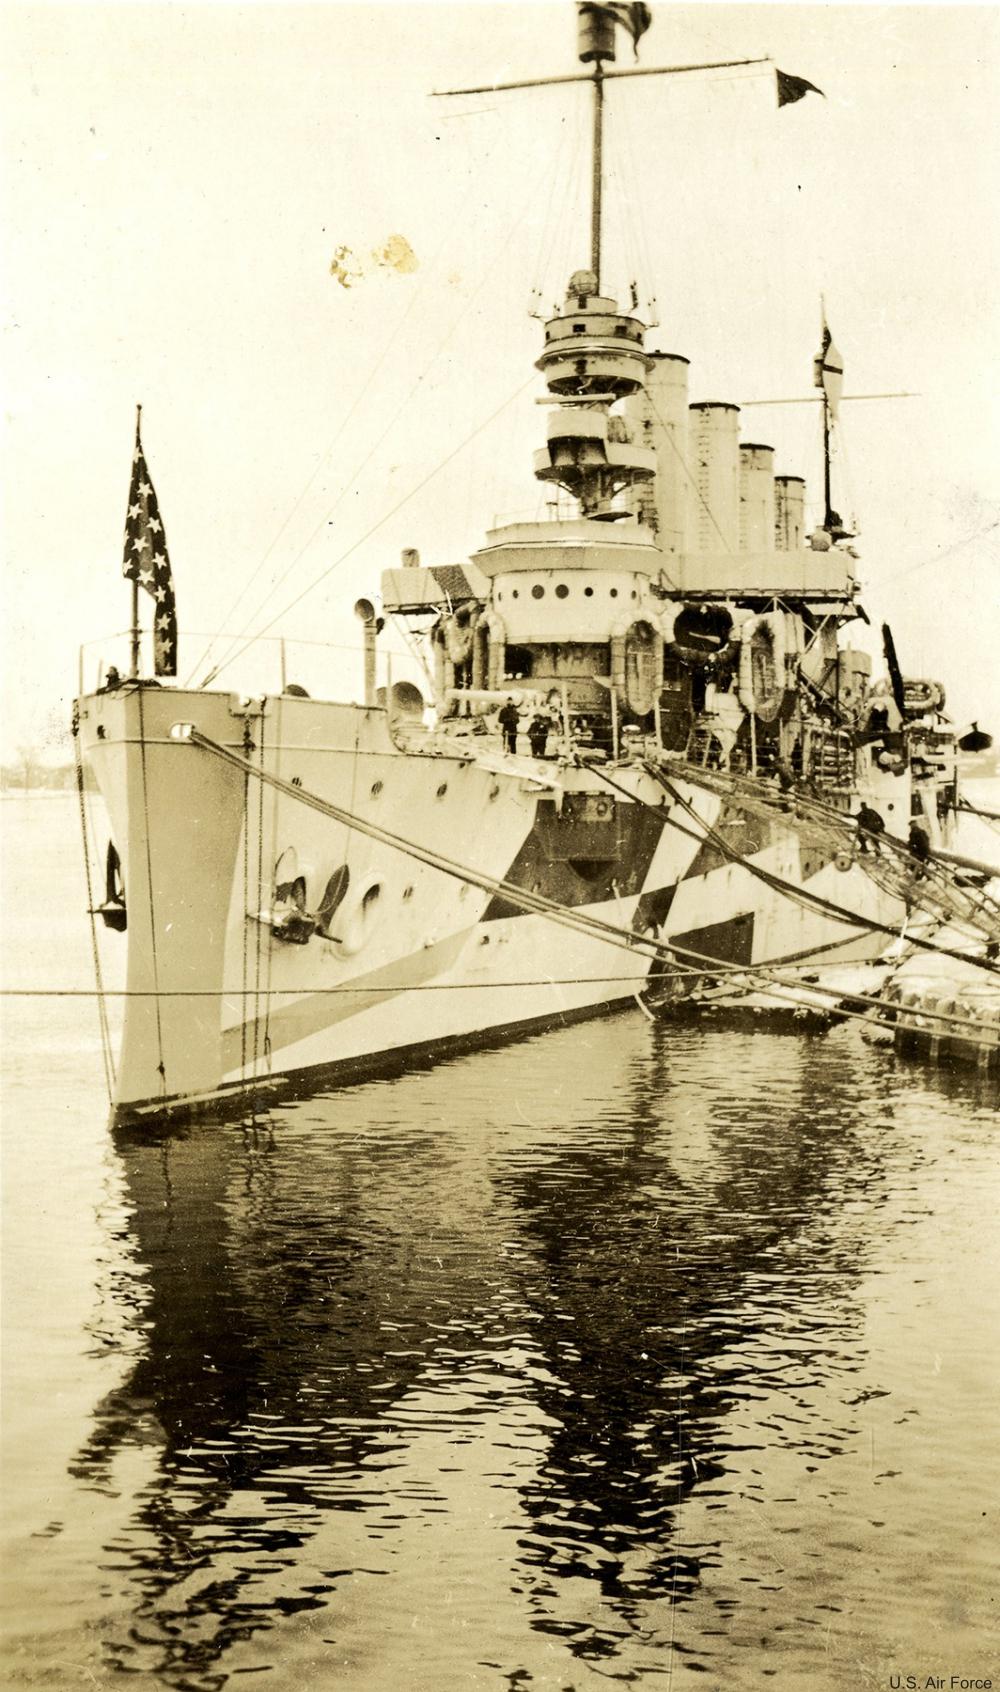 Dazzle camouflage ship circe 1917-1918.